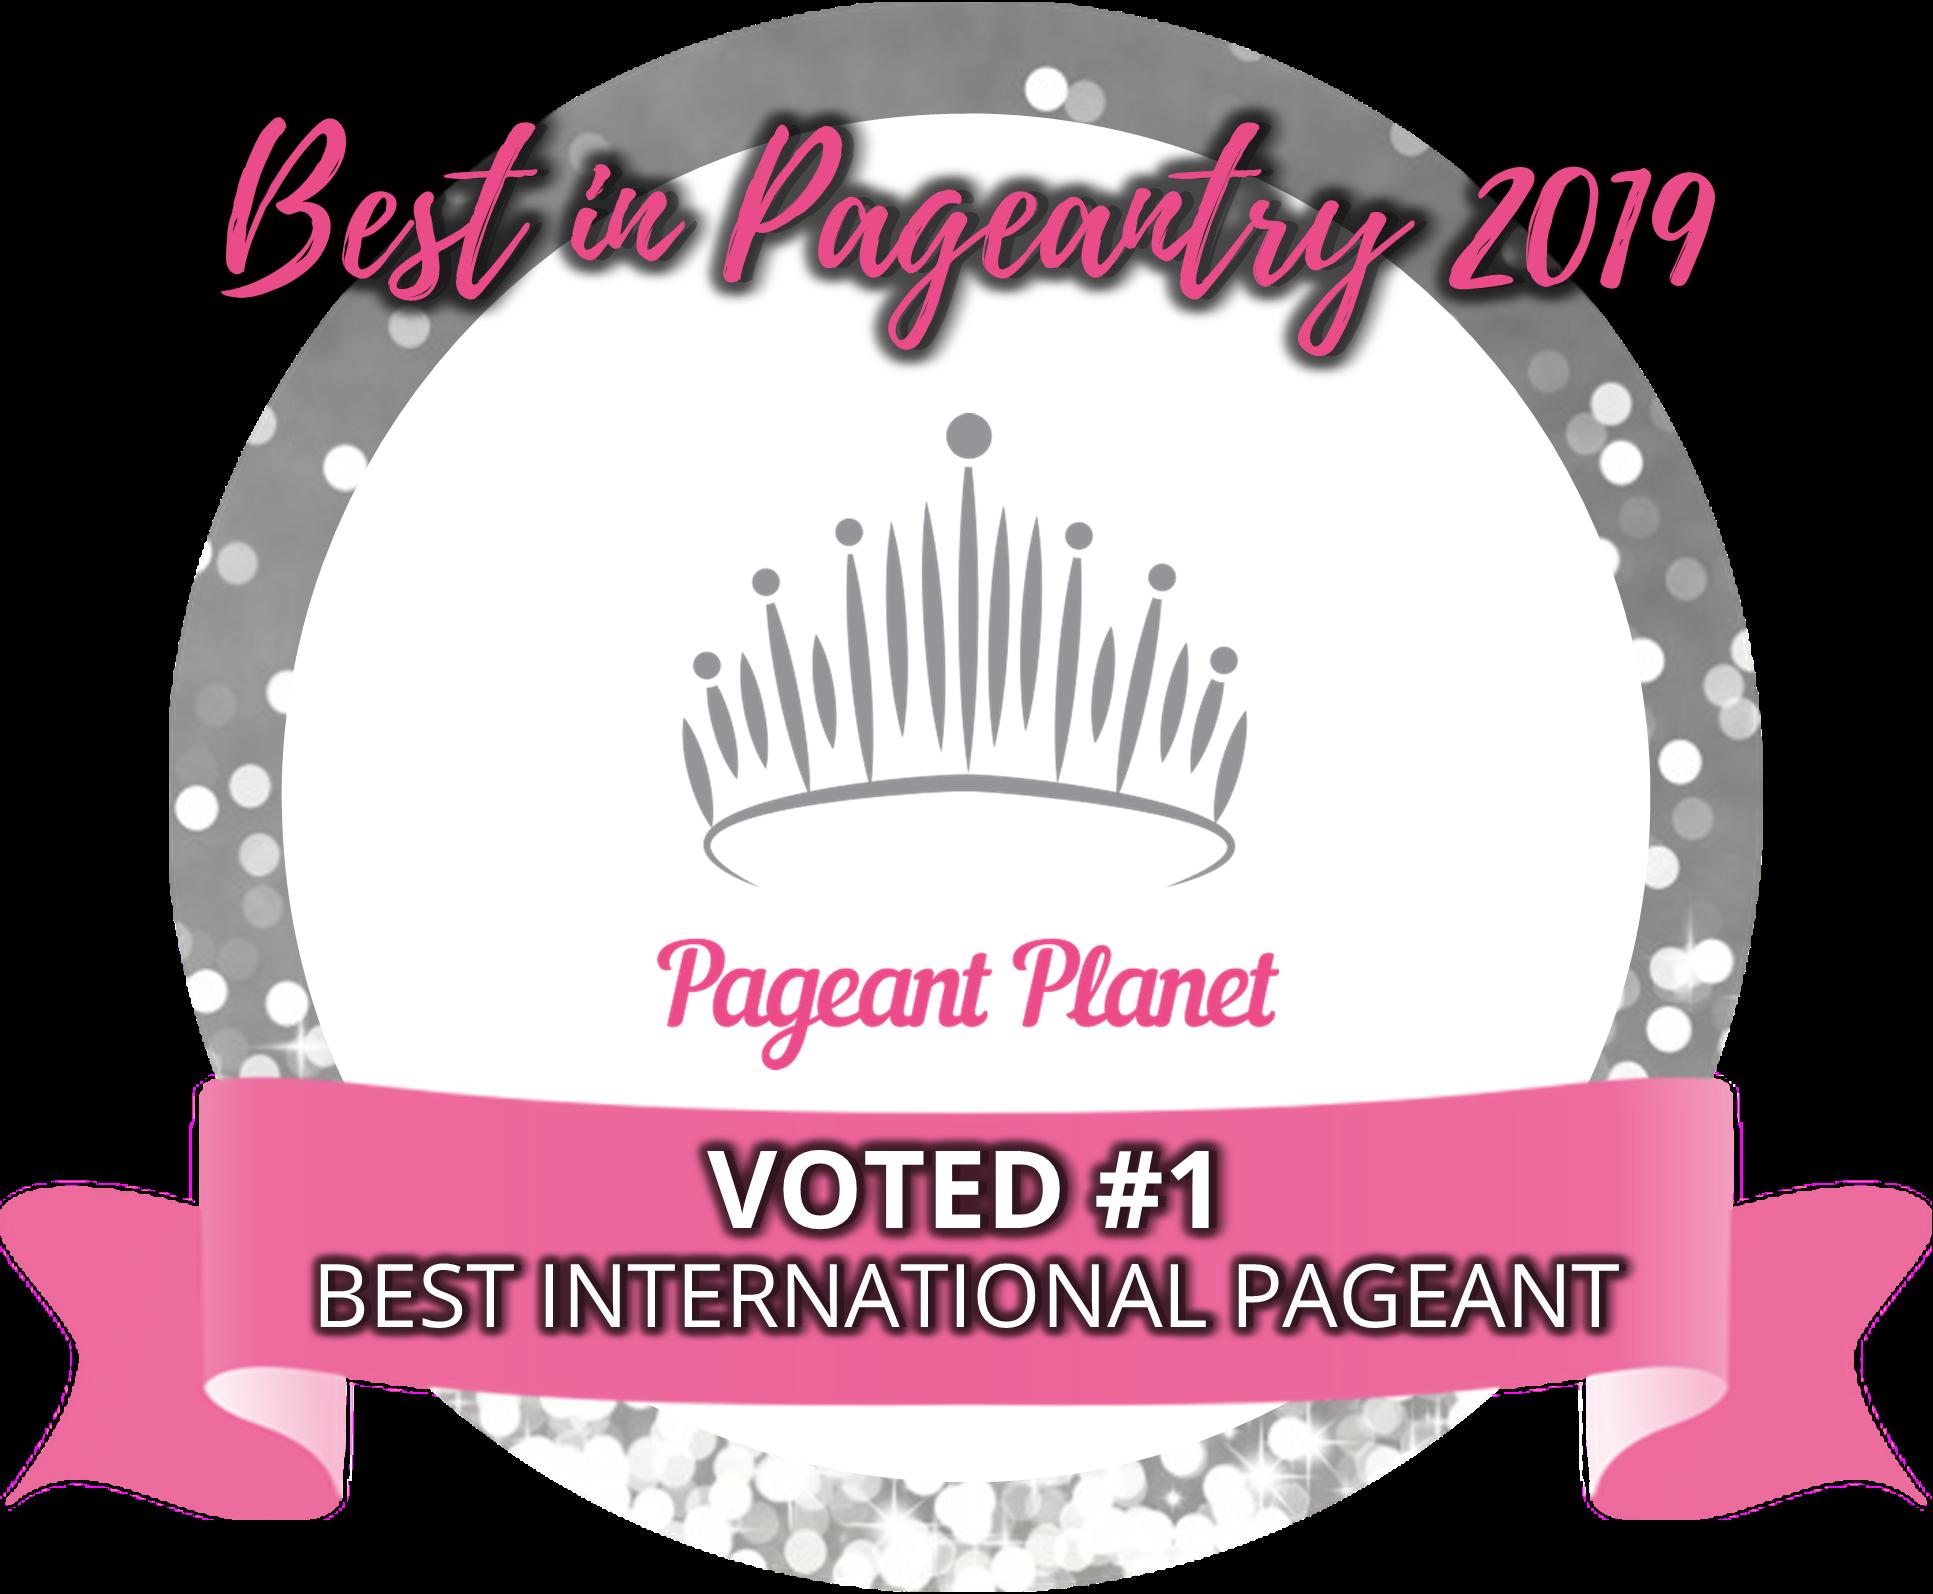 #1 Best International Pageant of 2019